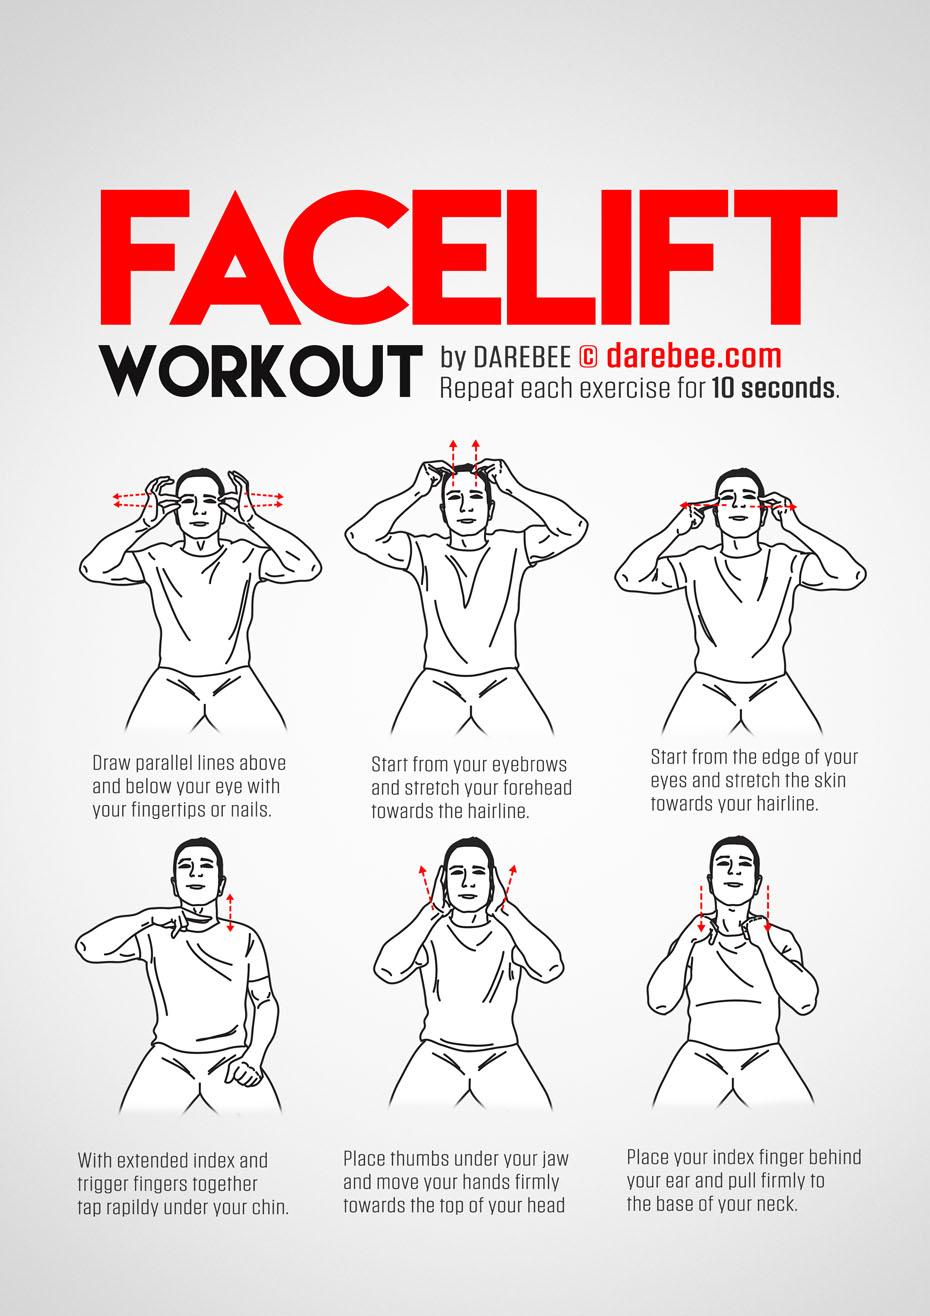 facelift workout